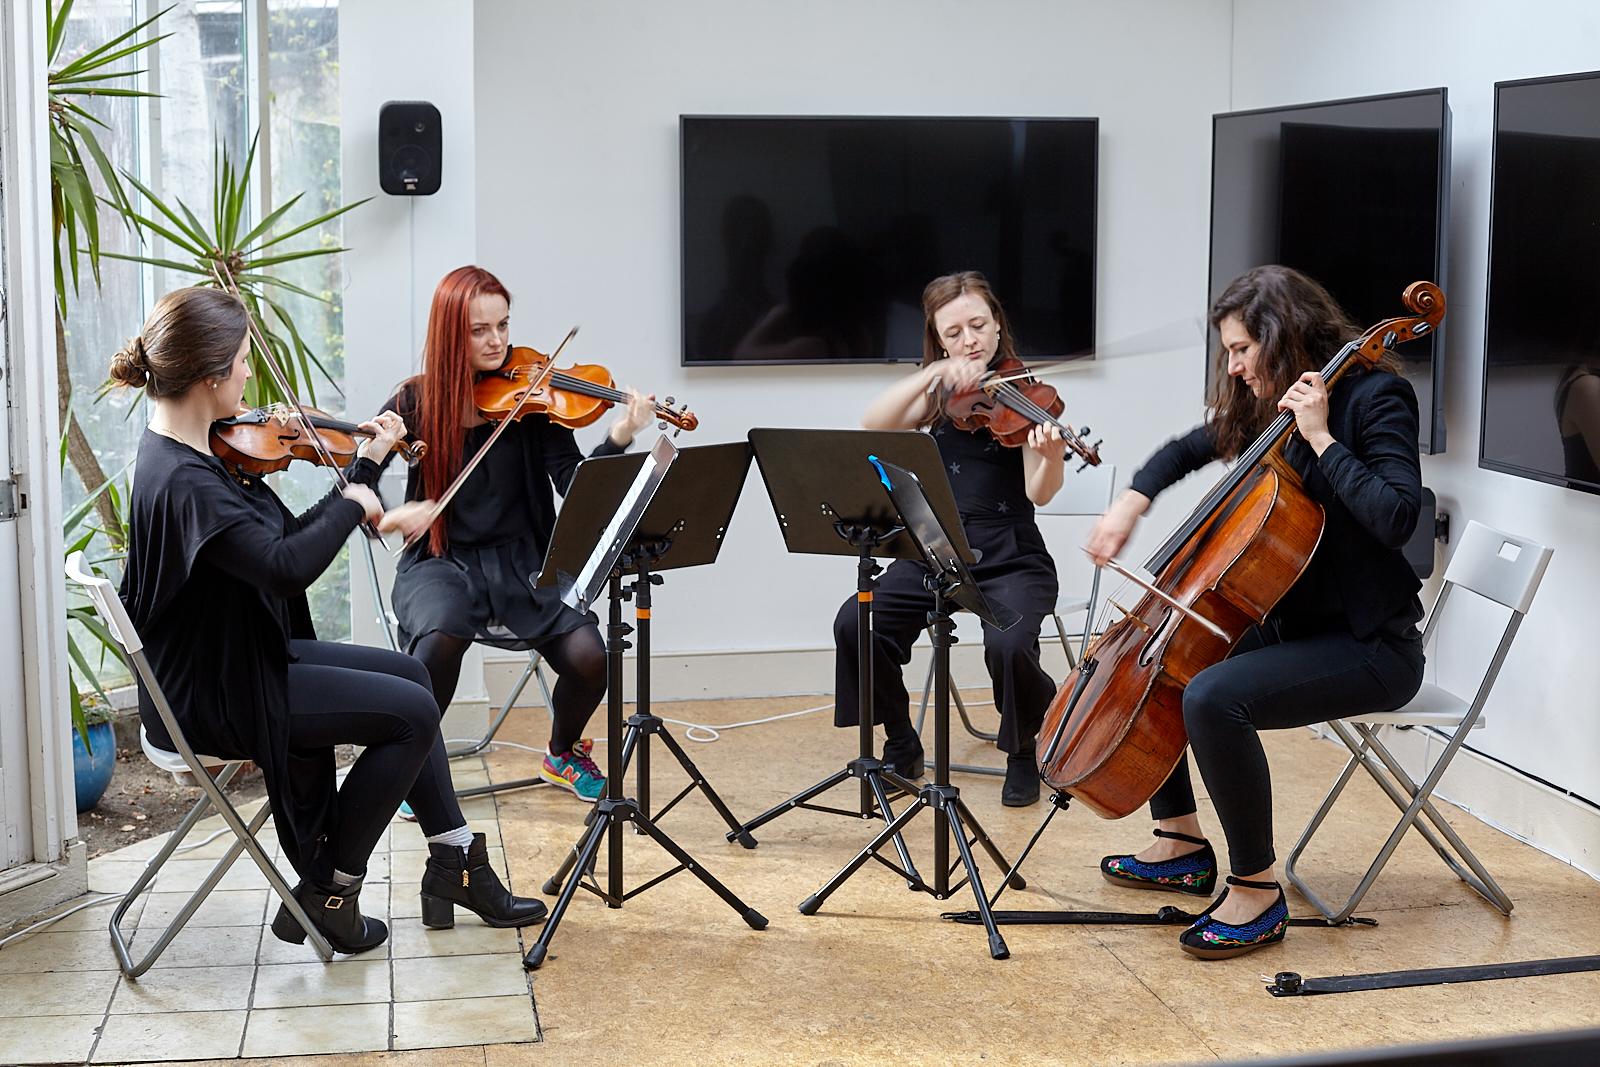 Annika Kahrs  String , 2019. Performed at Flat Time House (Annika Kahrs 10)